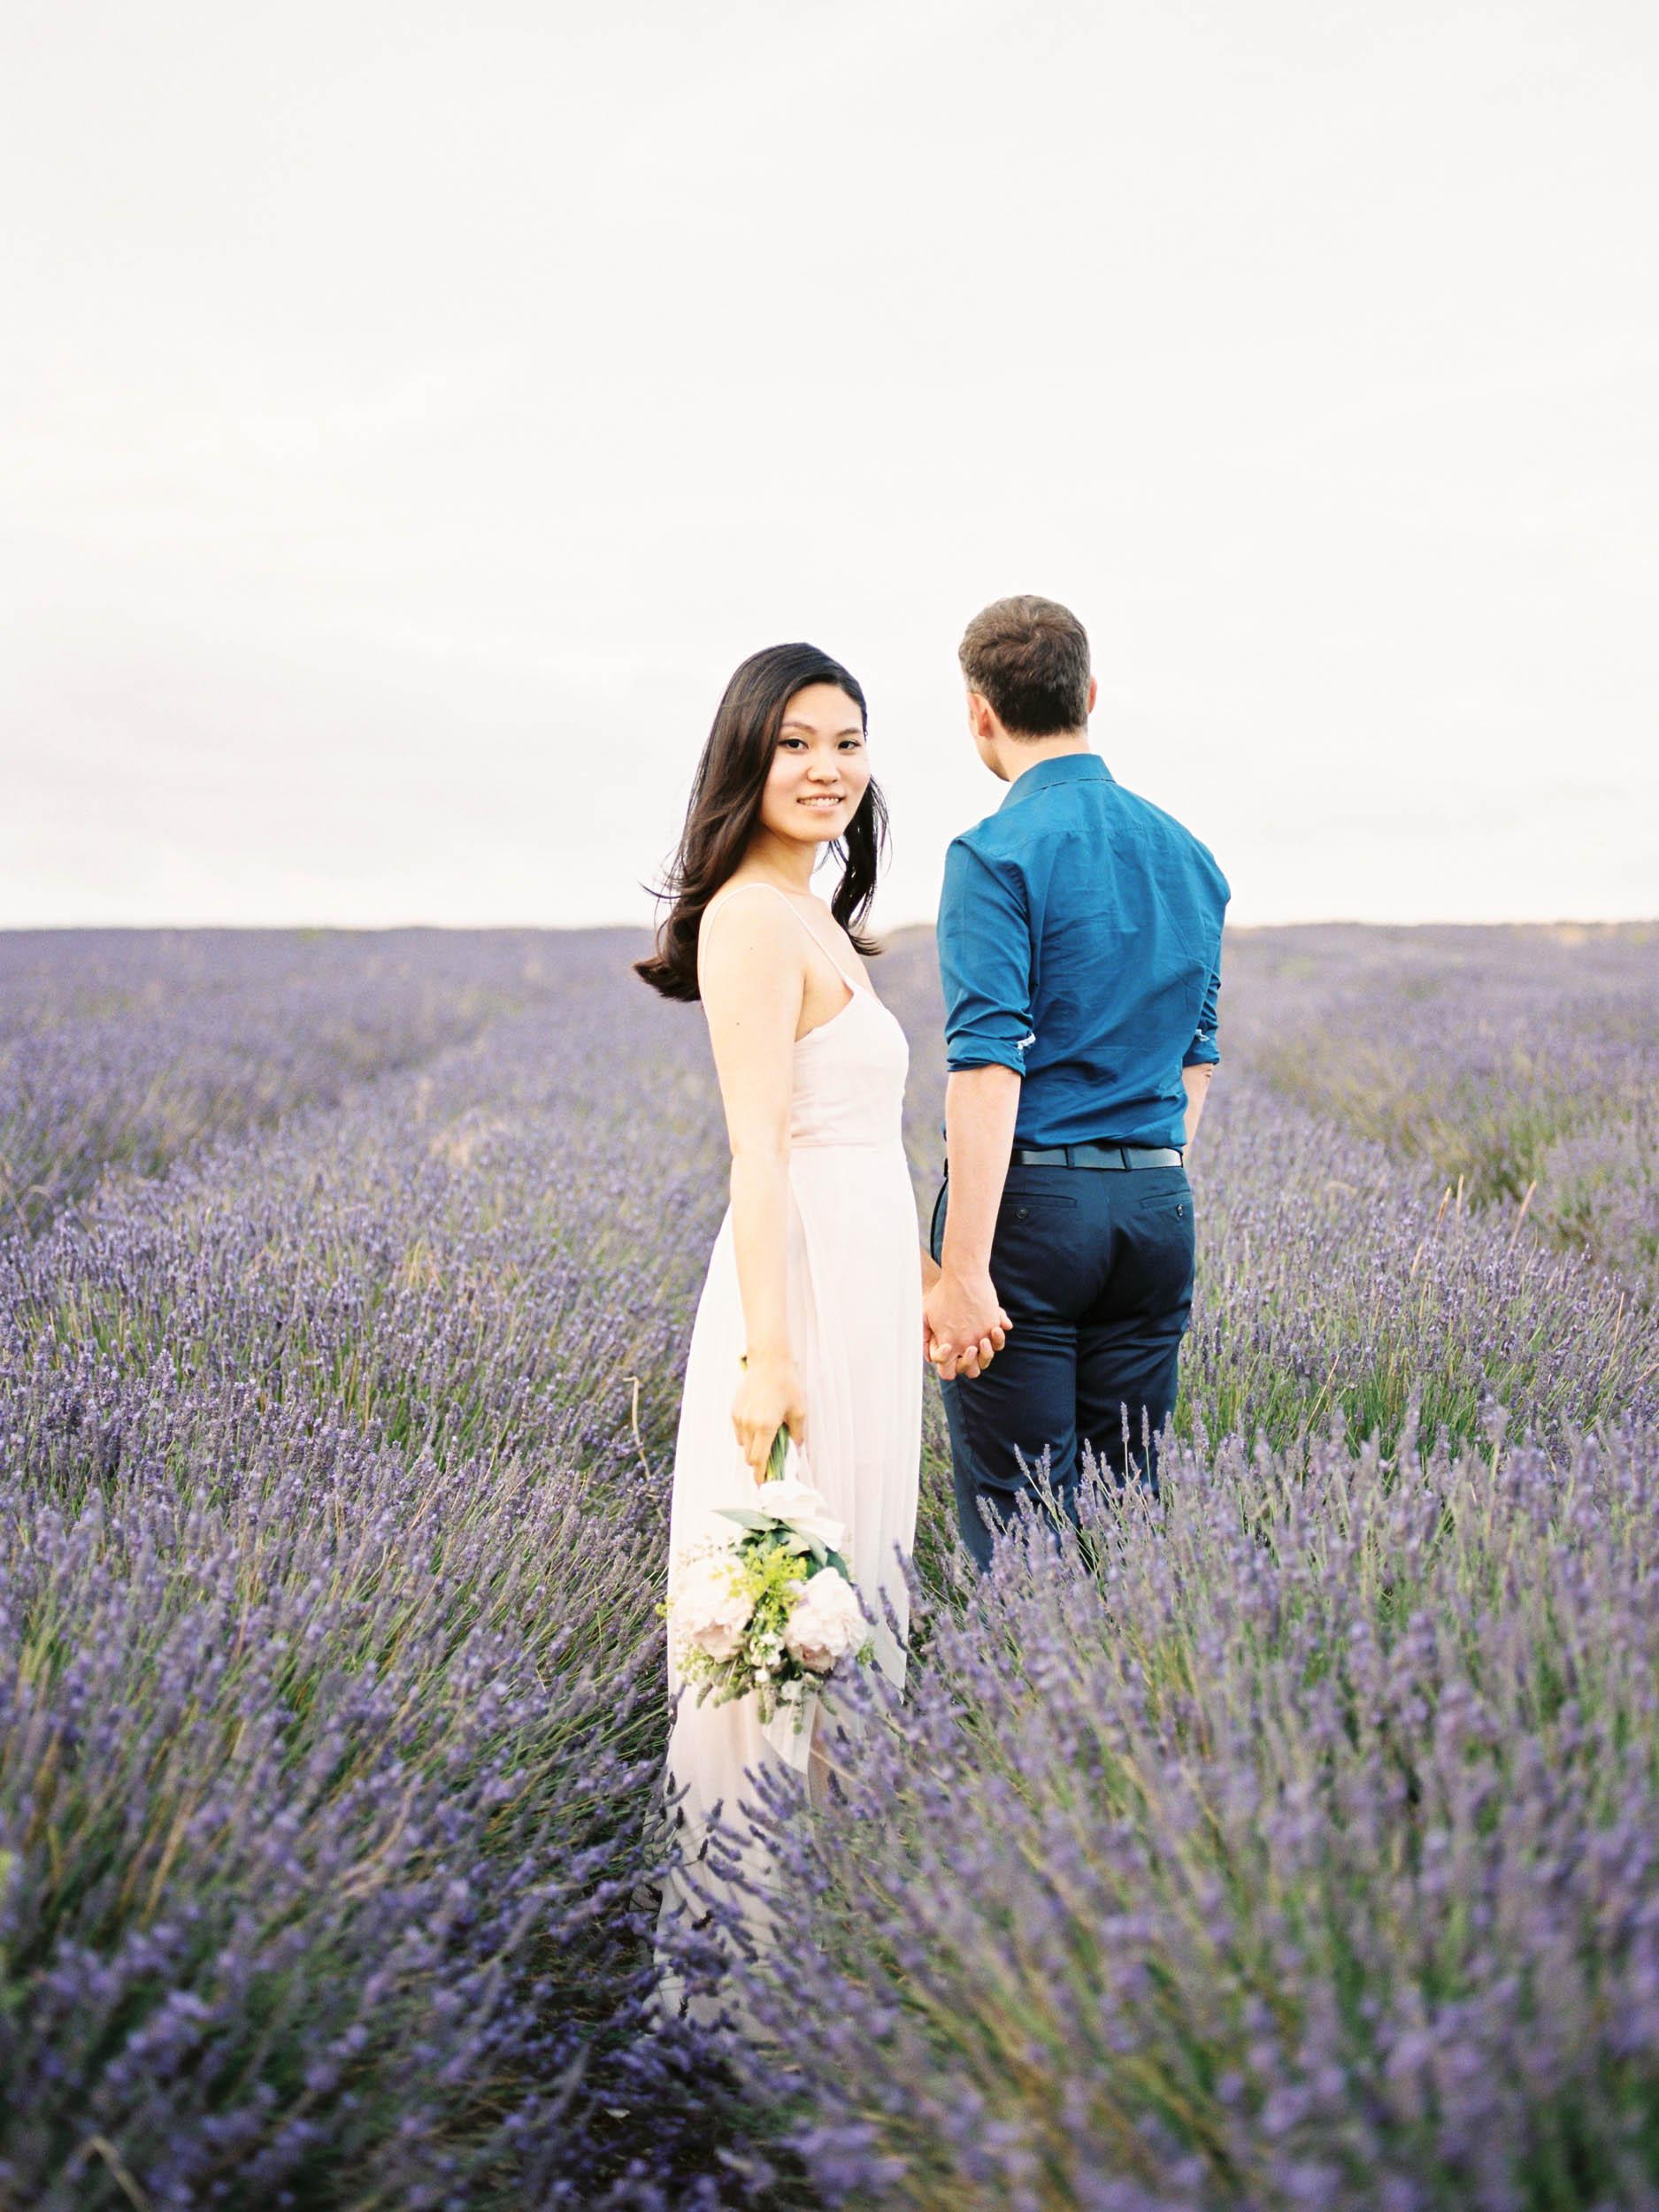 Amy O'Boyle Photography- Destination & UK Fine Art Film Wedding Photographer- Hitchin Lavender Engagement Shoot-26.jpg